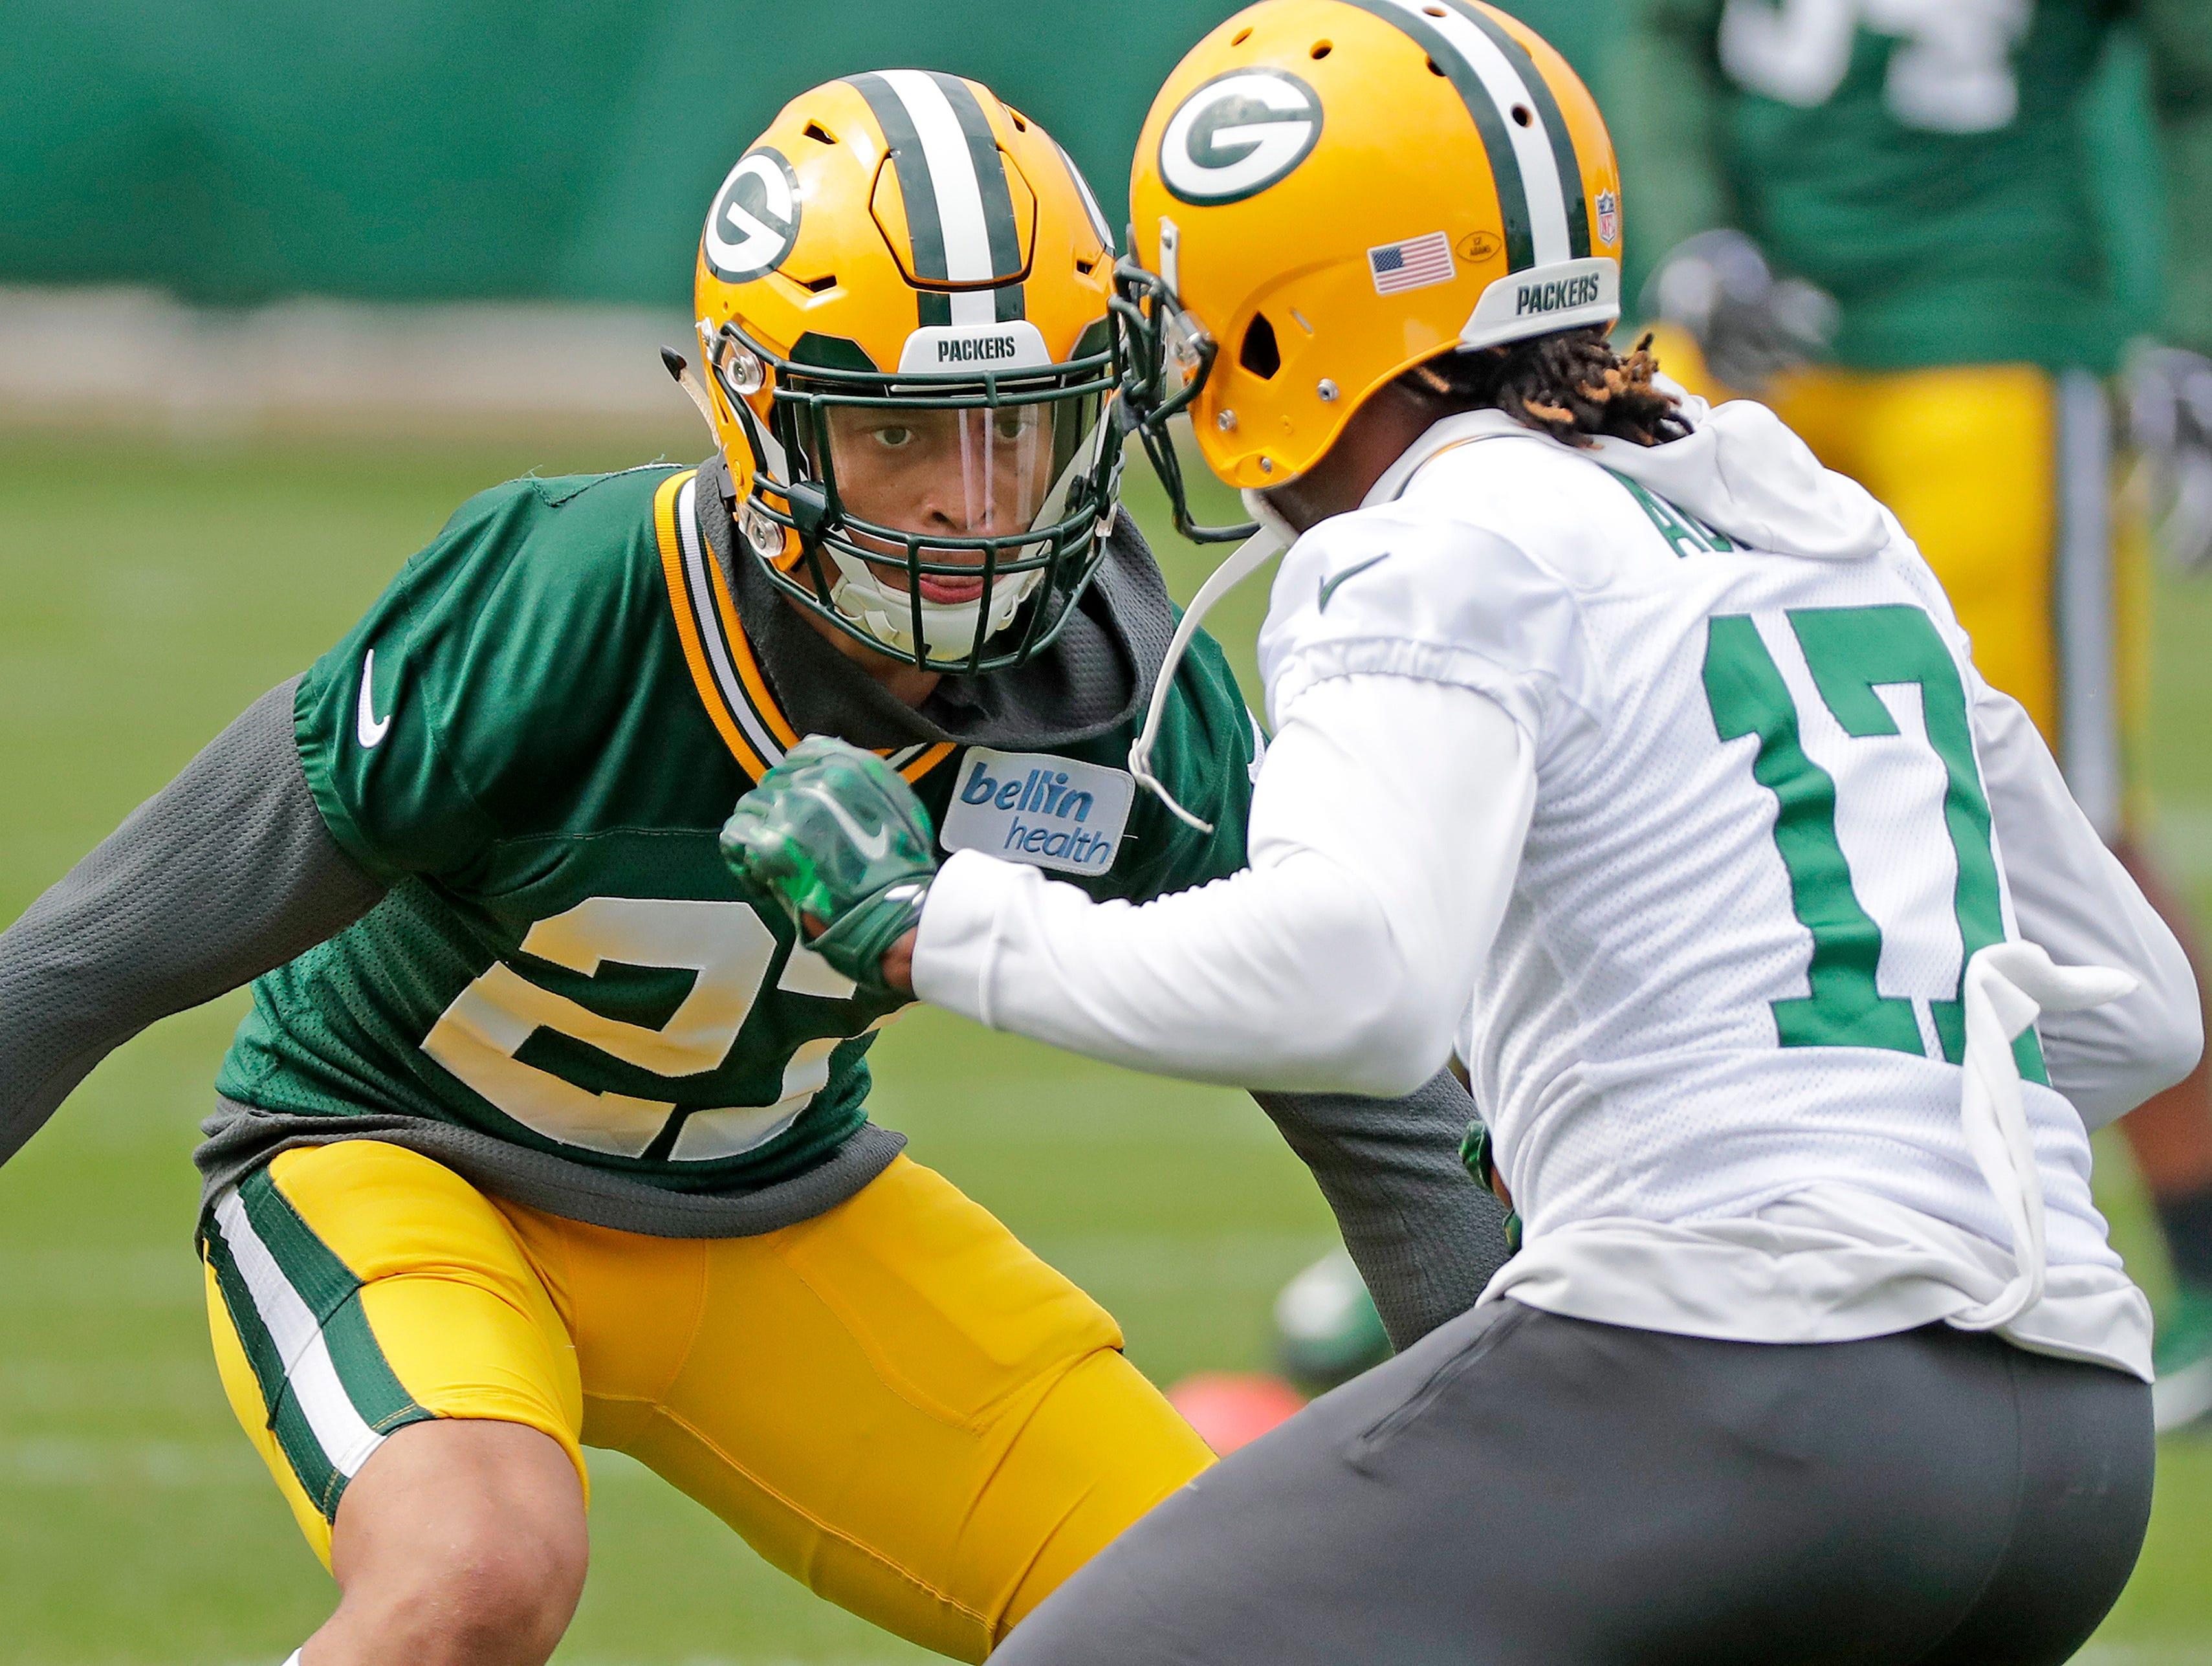 Green Bay Packers defensive back defensive back Josh Jones (27) tries to out juke wide receiver Davante Adams (17)  during practice Wednesday, October 3, 2018 at Clarke Hinkle Field in Ashwaubenon, Wis.